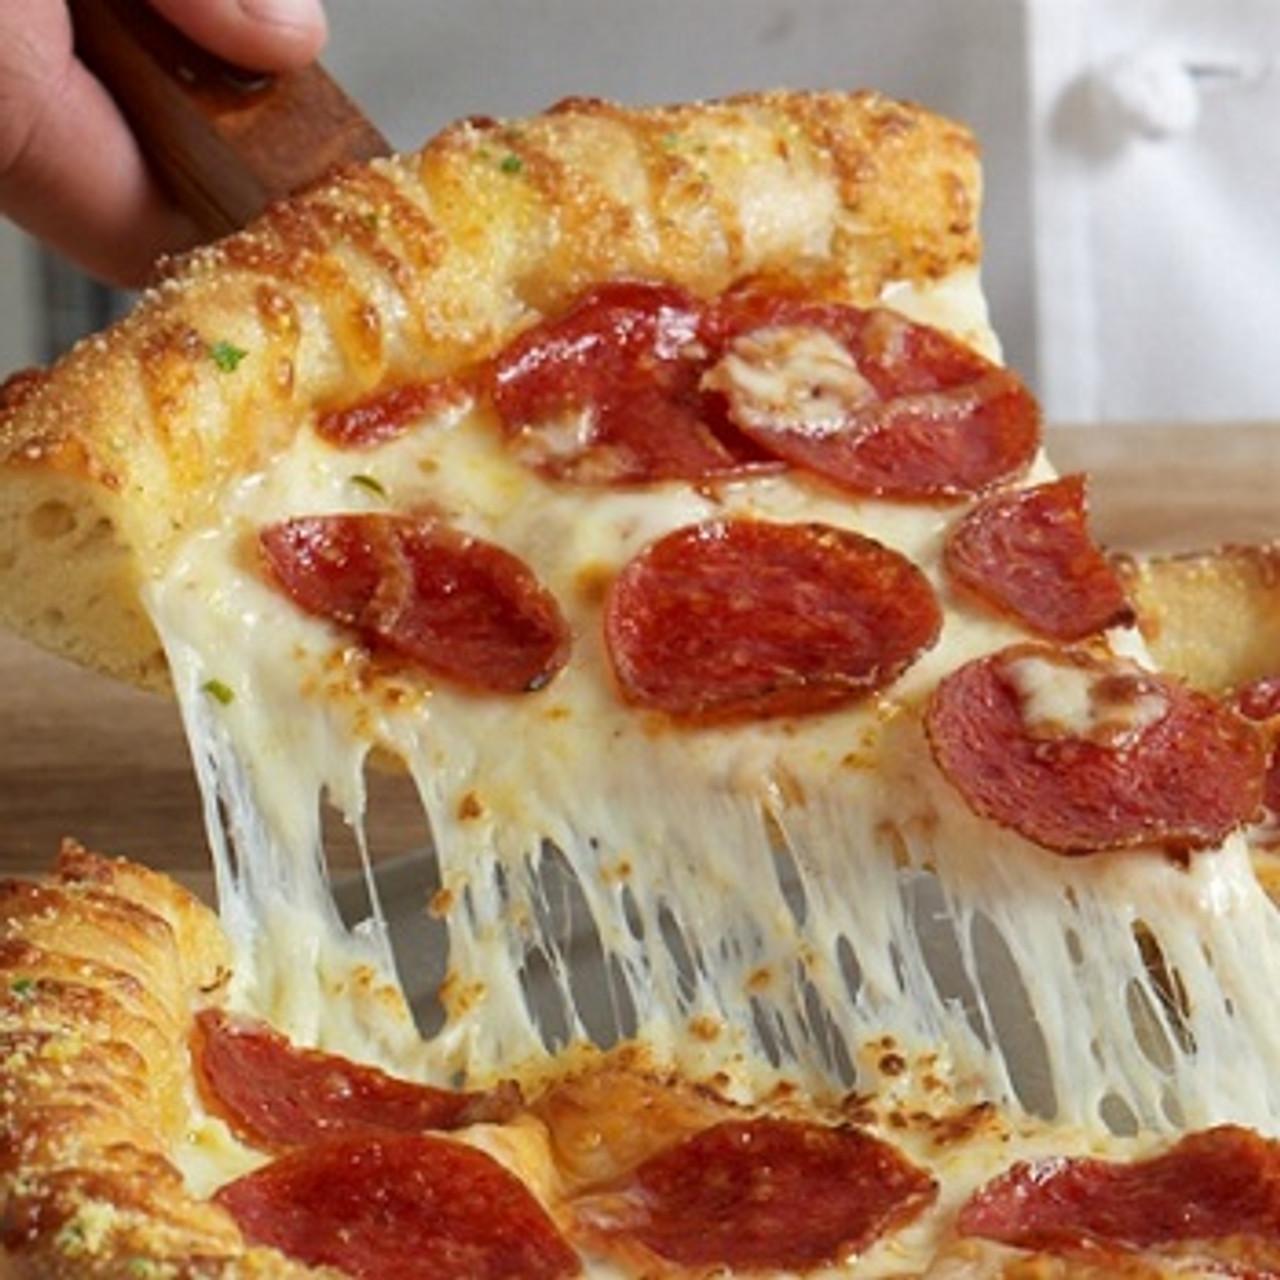 Dominos pizza large 3 topping pizza half price oregon - Dominos pizza paterna ...